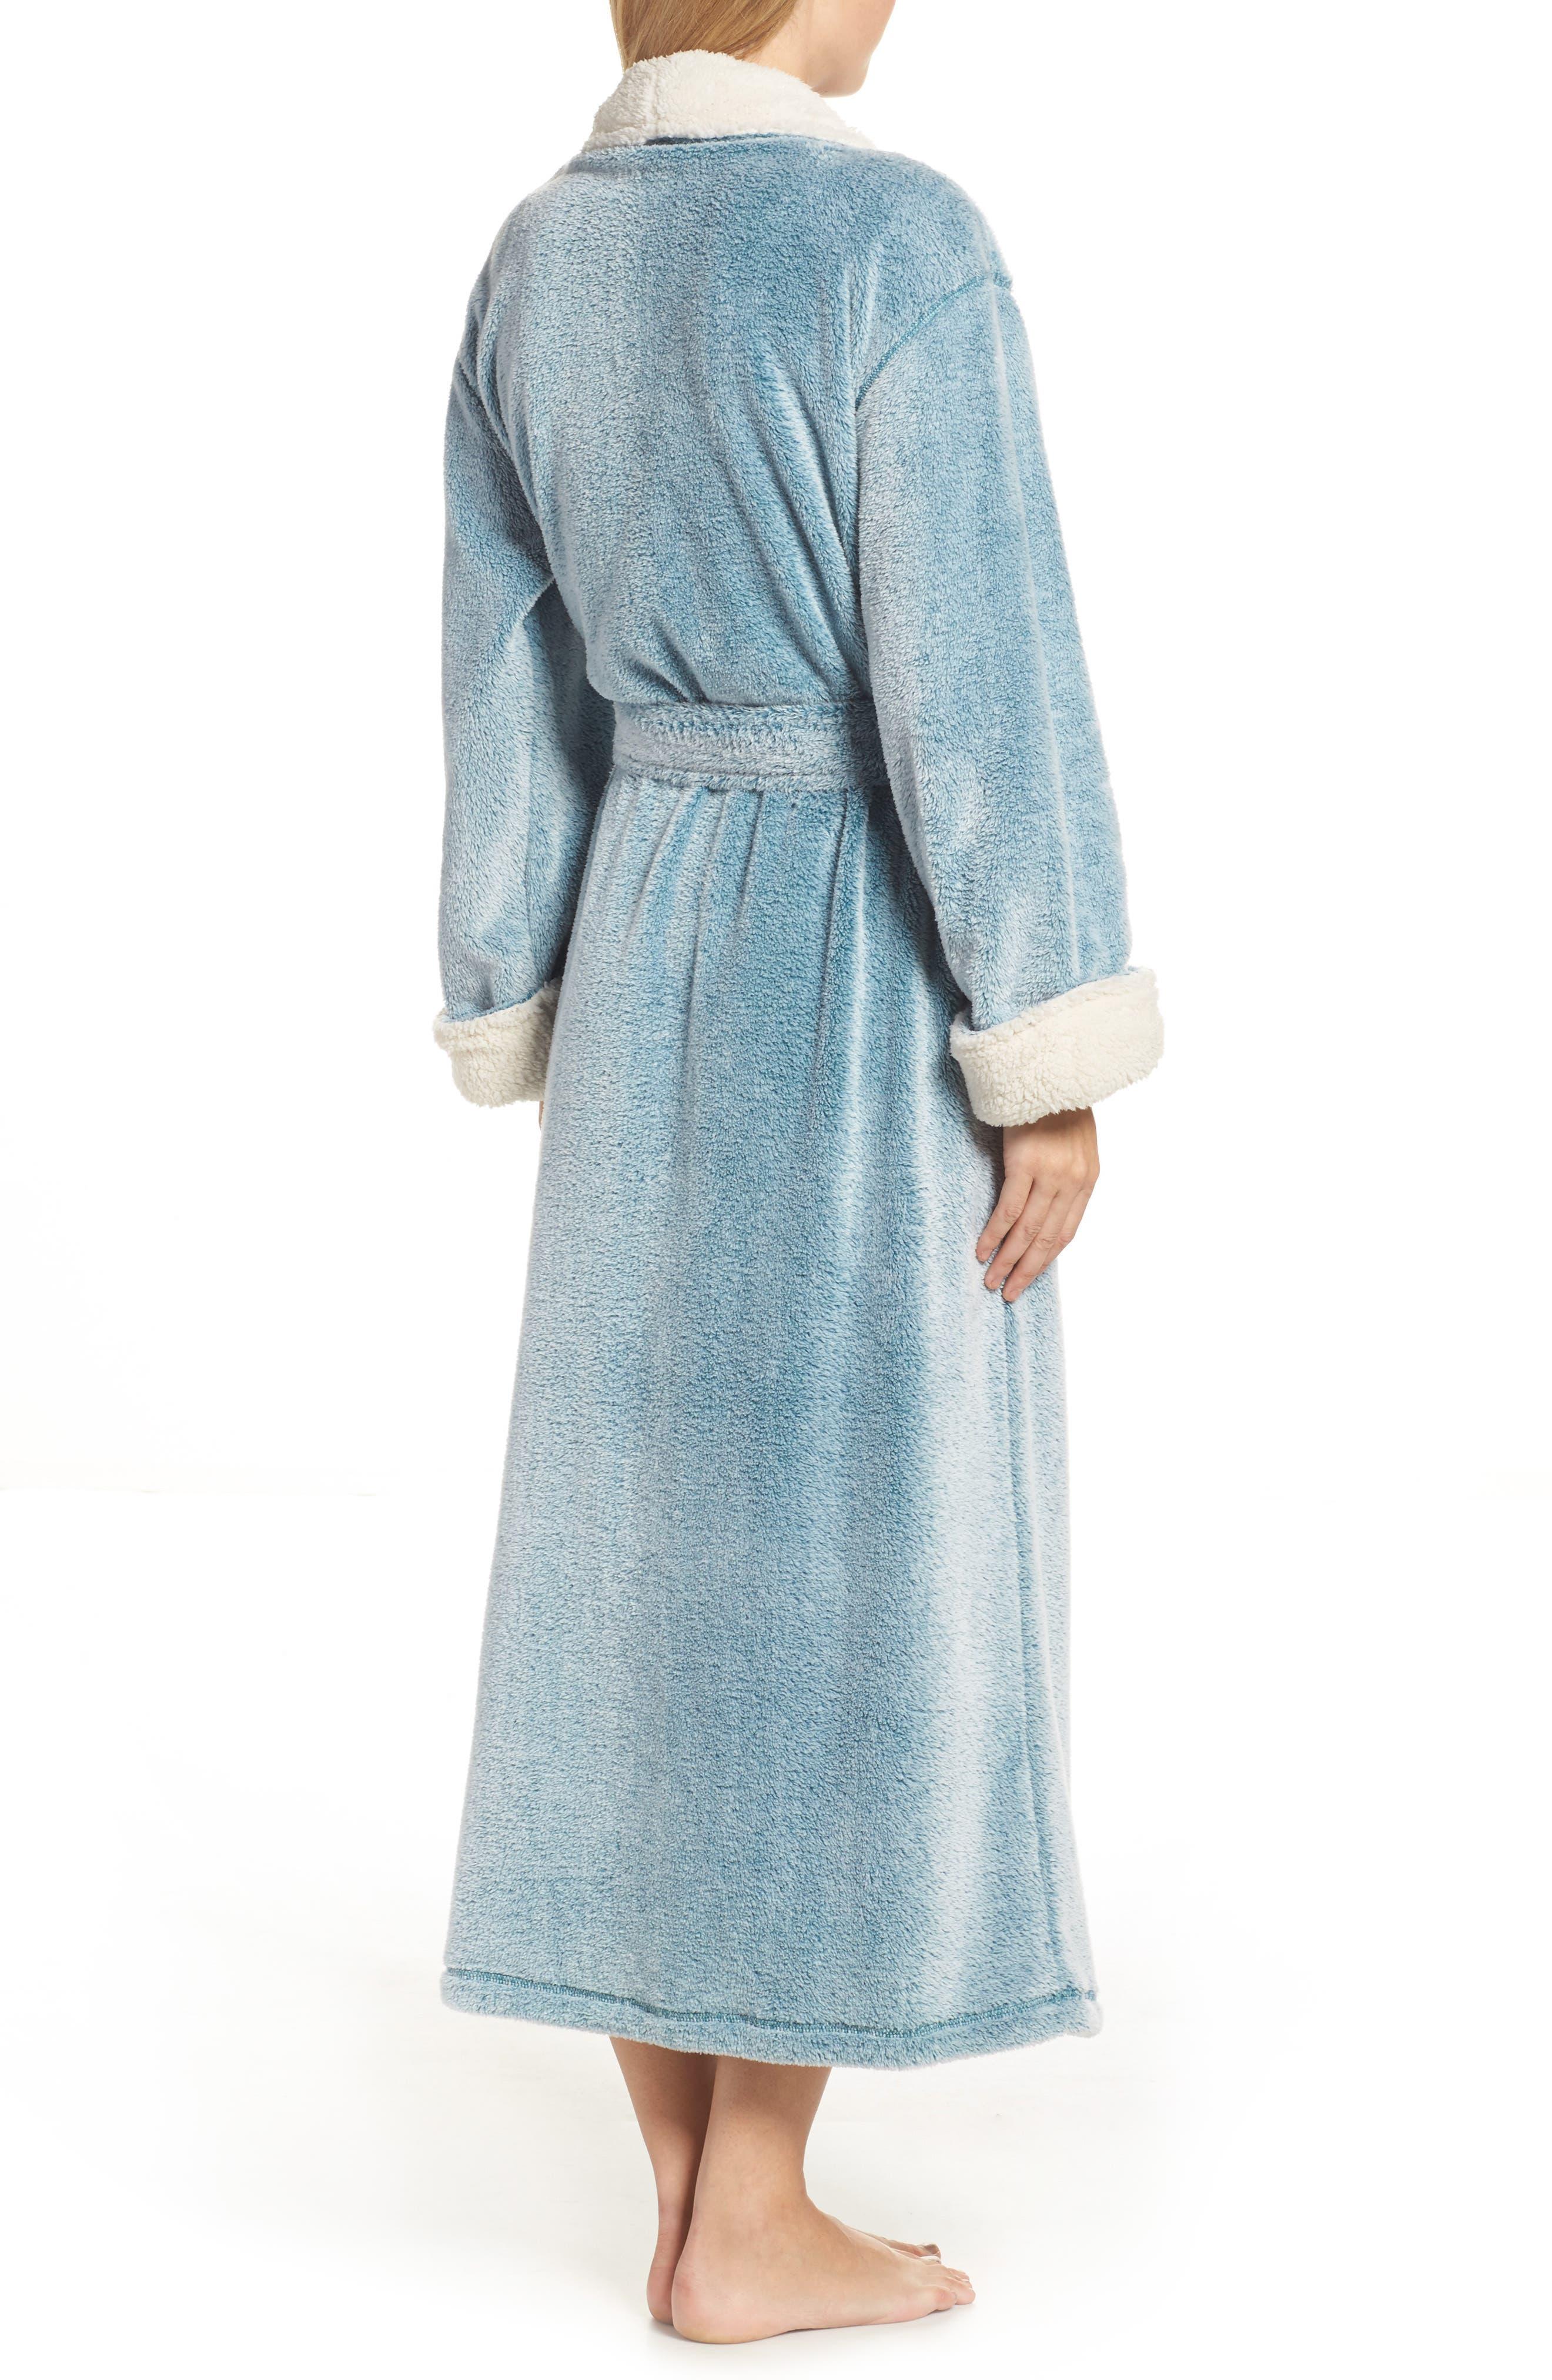 Plush Velour Robe,                             Alternate thumbnail 2, color,                             LIGHT BLUE